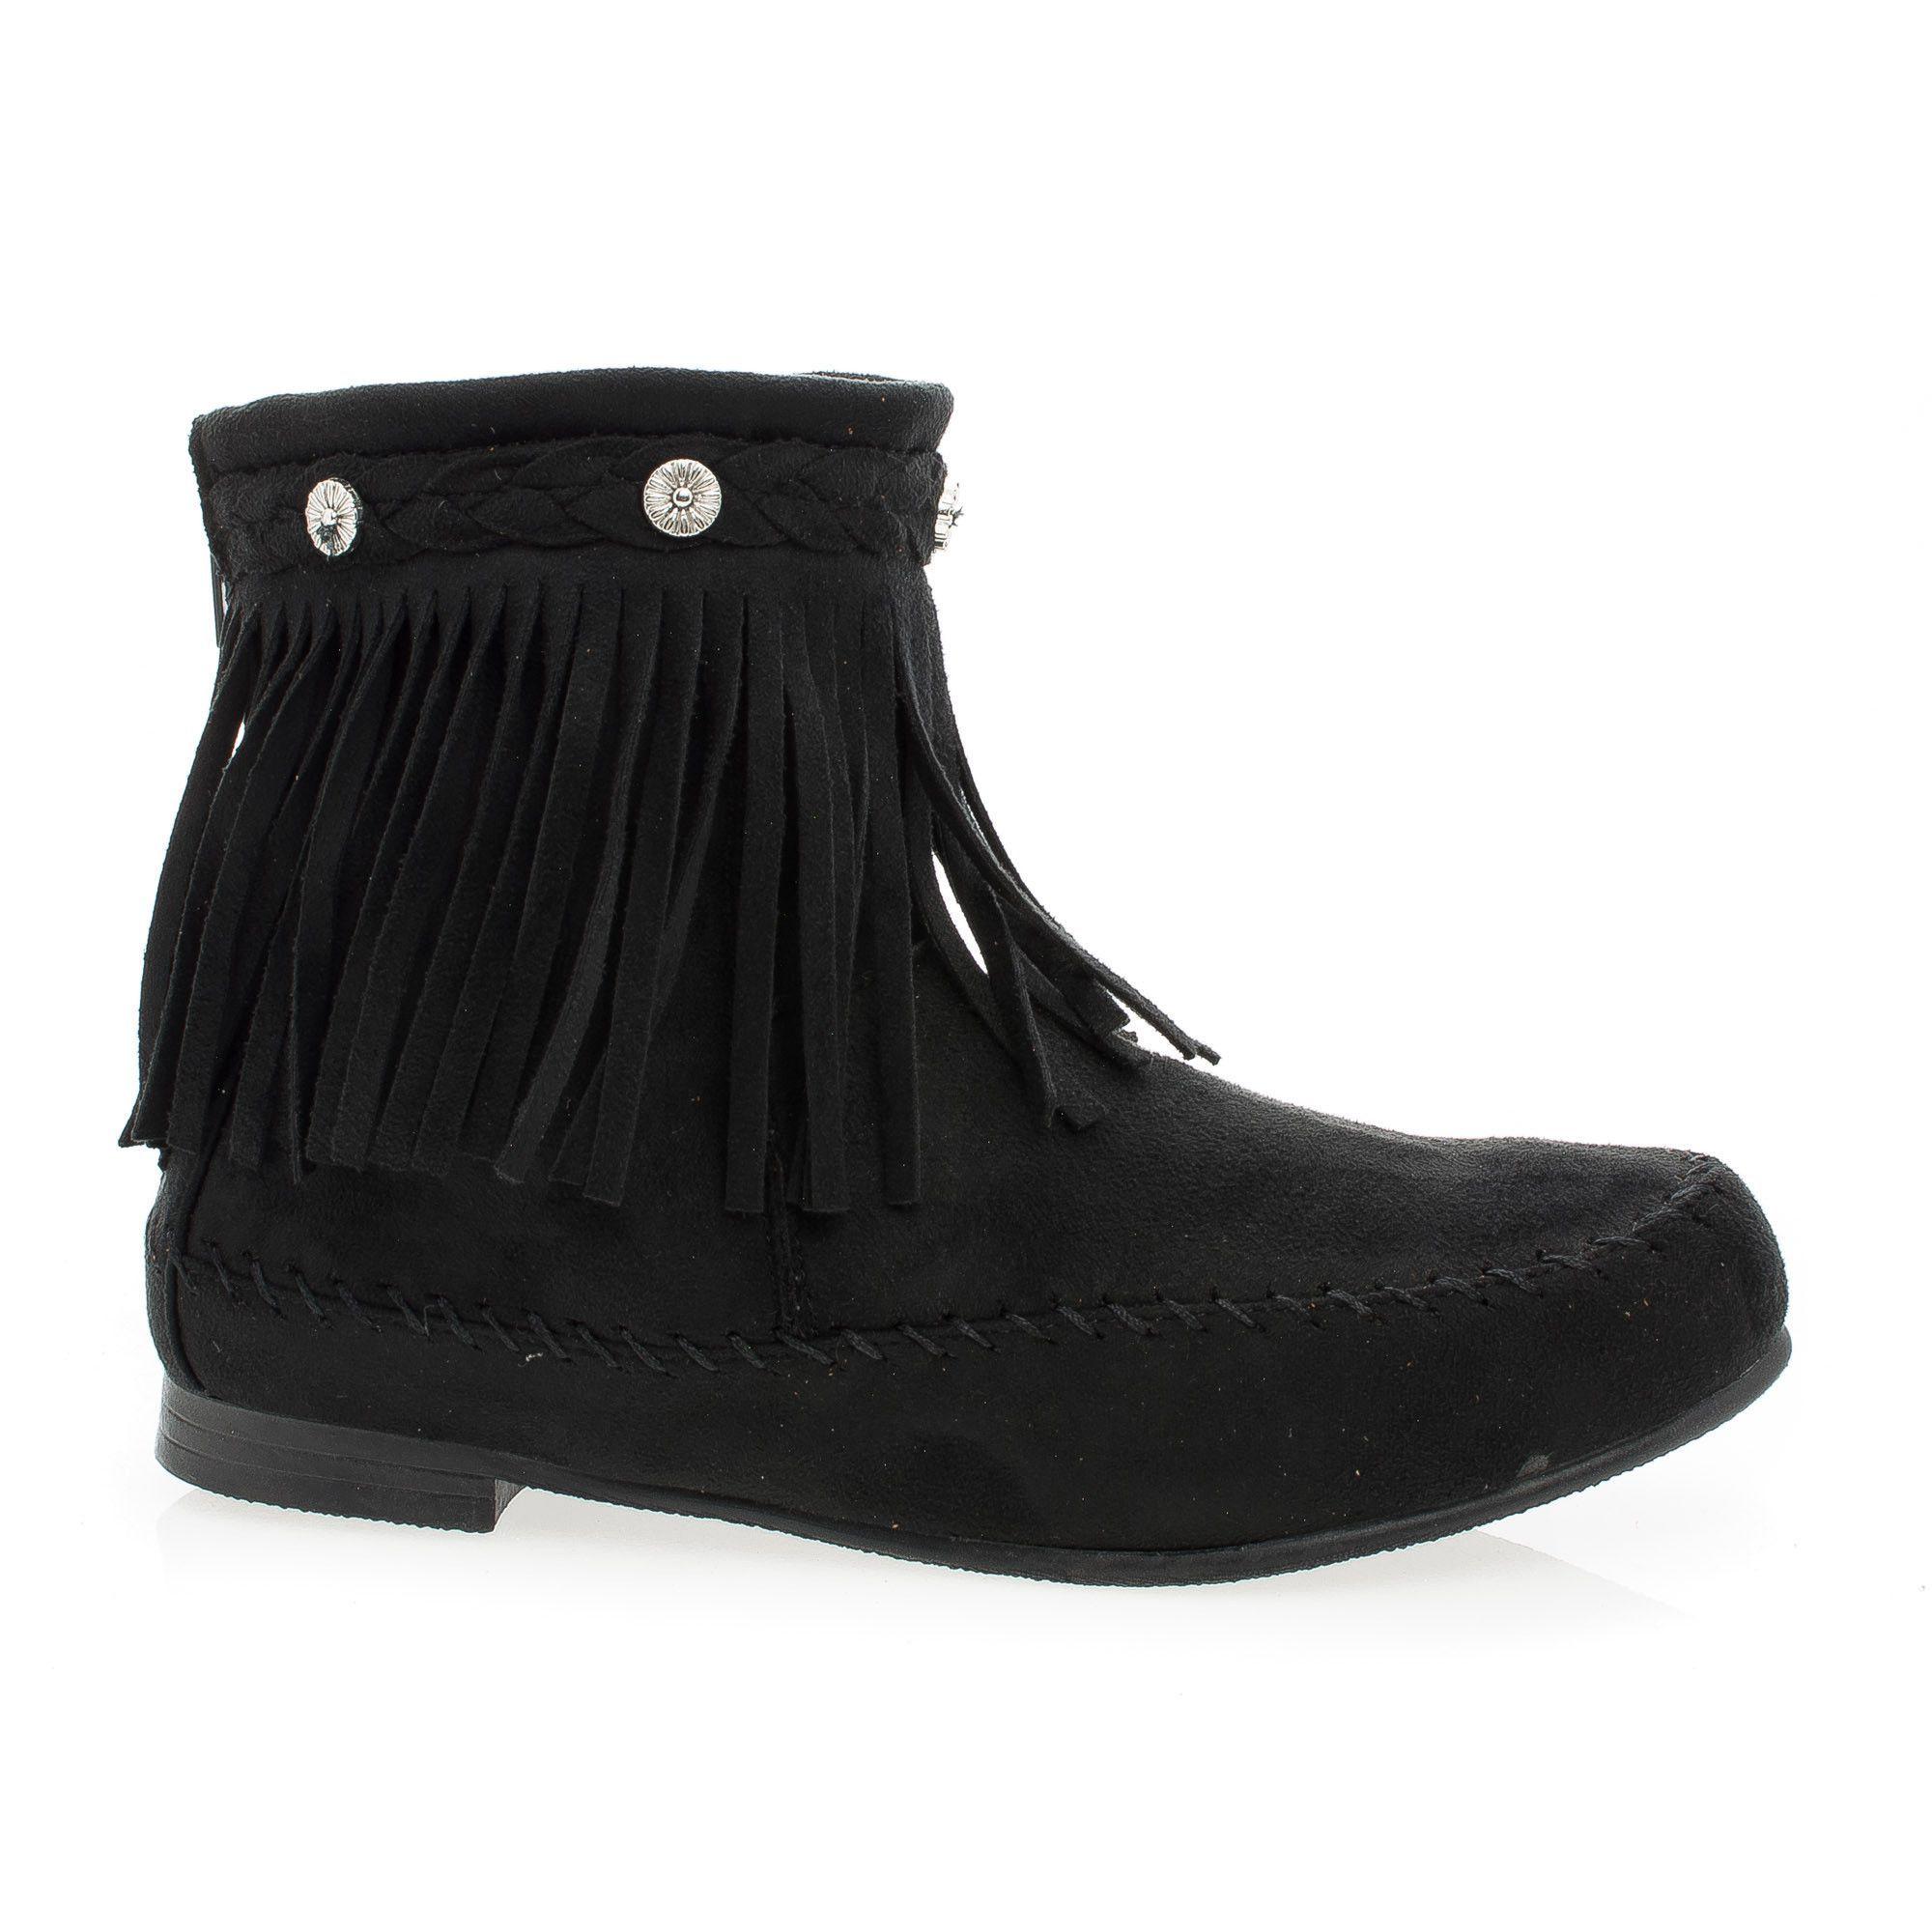 Starcy93 Moccasin Braid Fringe Round Toe Flat Ankle Boots